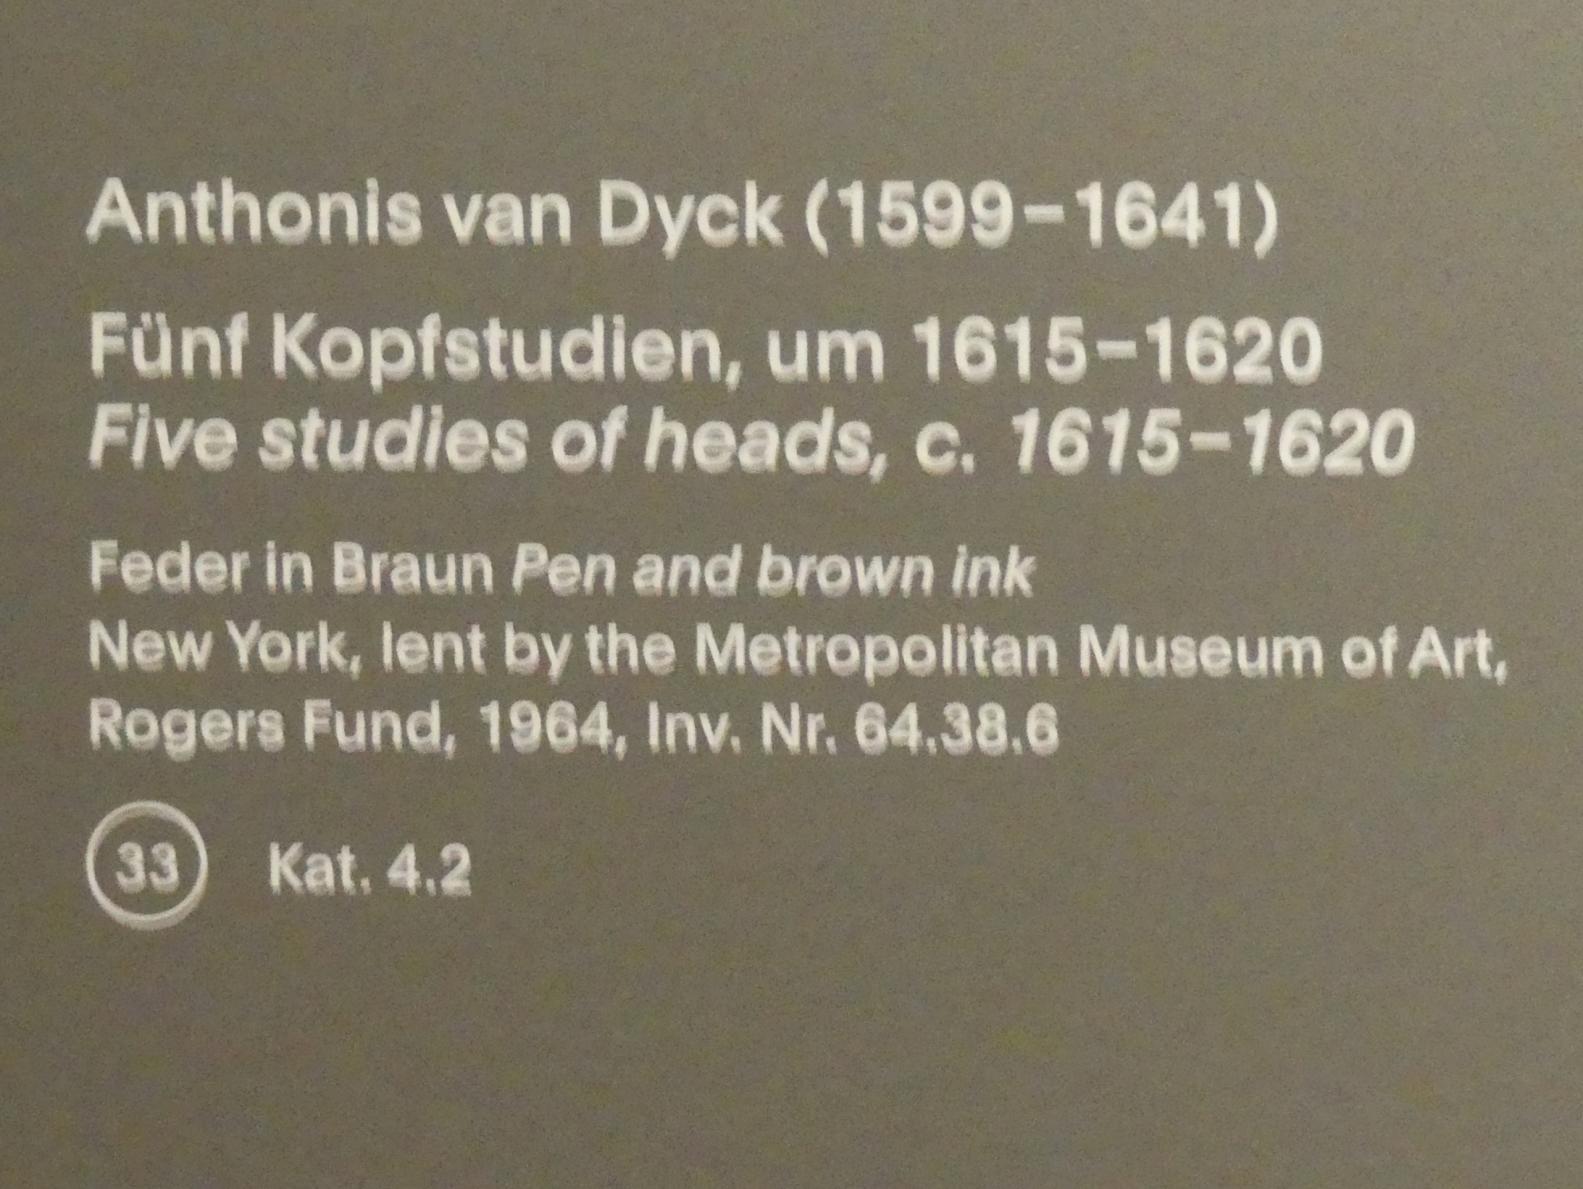 Anthonis (Anton) van Dyck: Fünf Kopfstudien, um 1615 - 1620, Bild 3/3